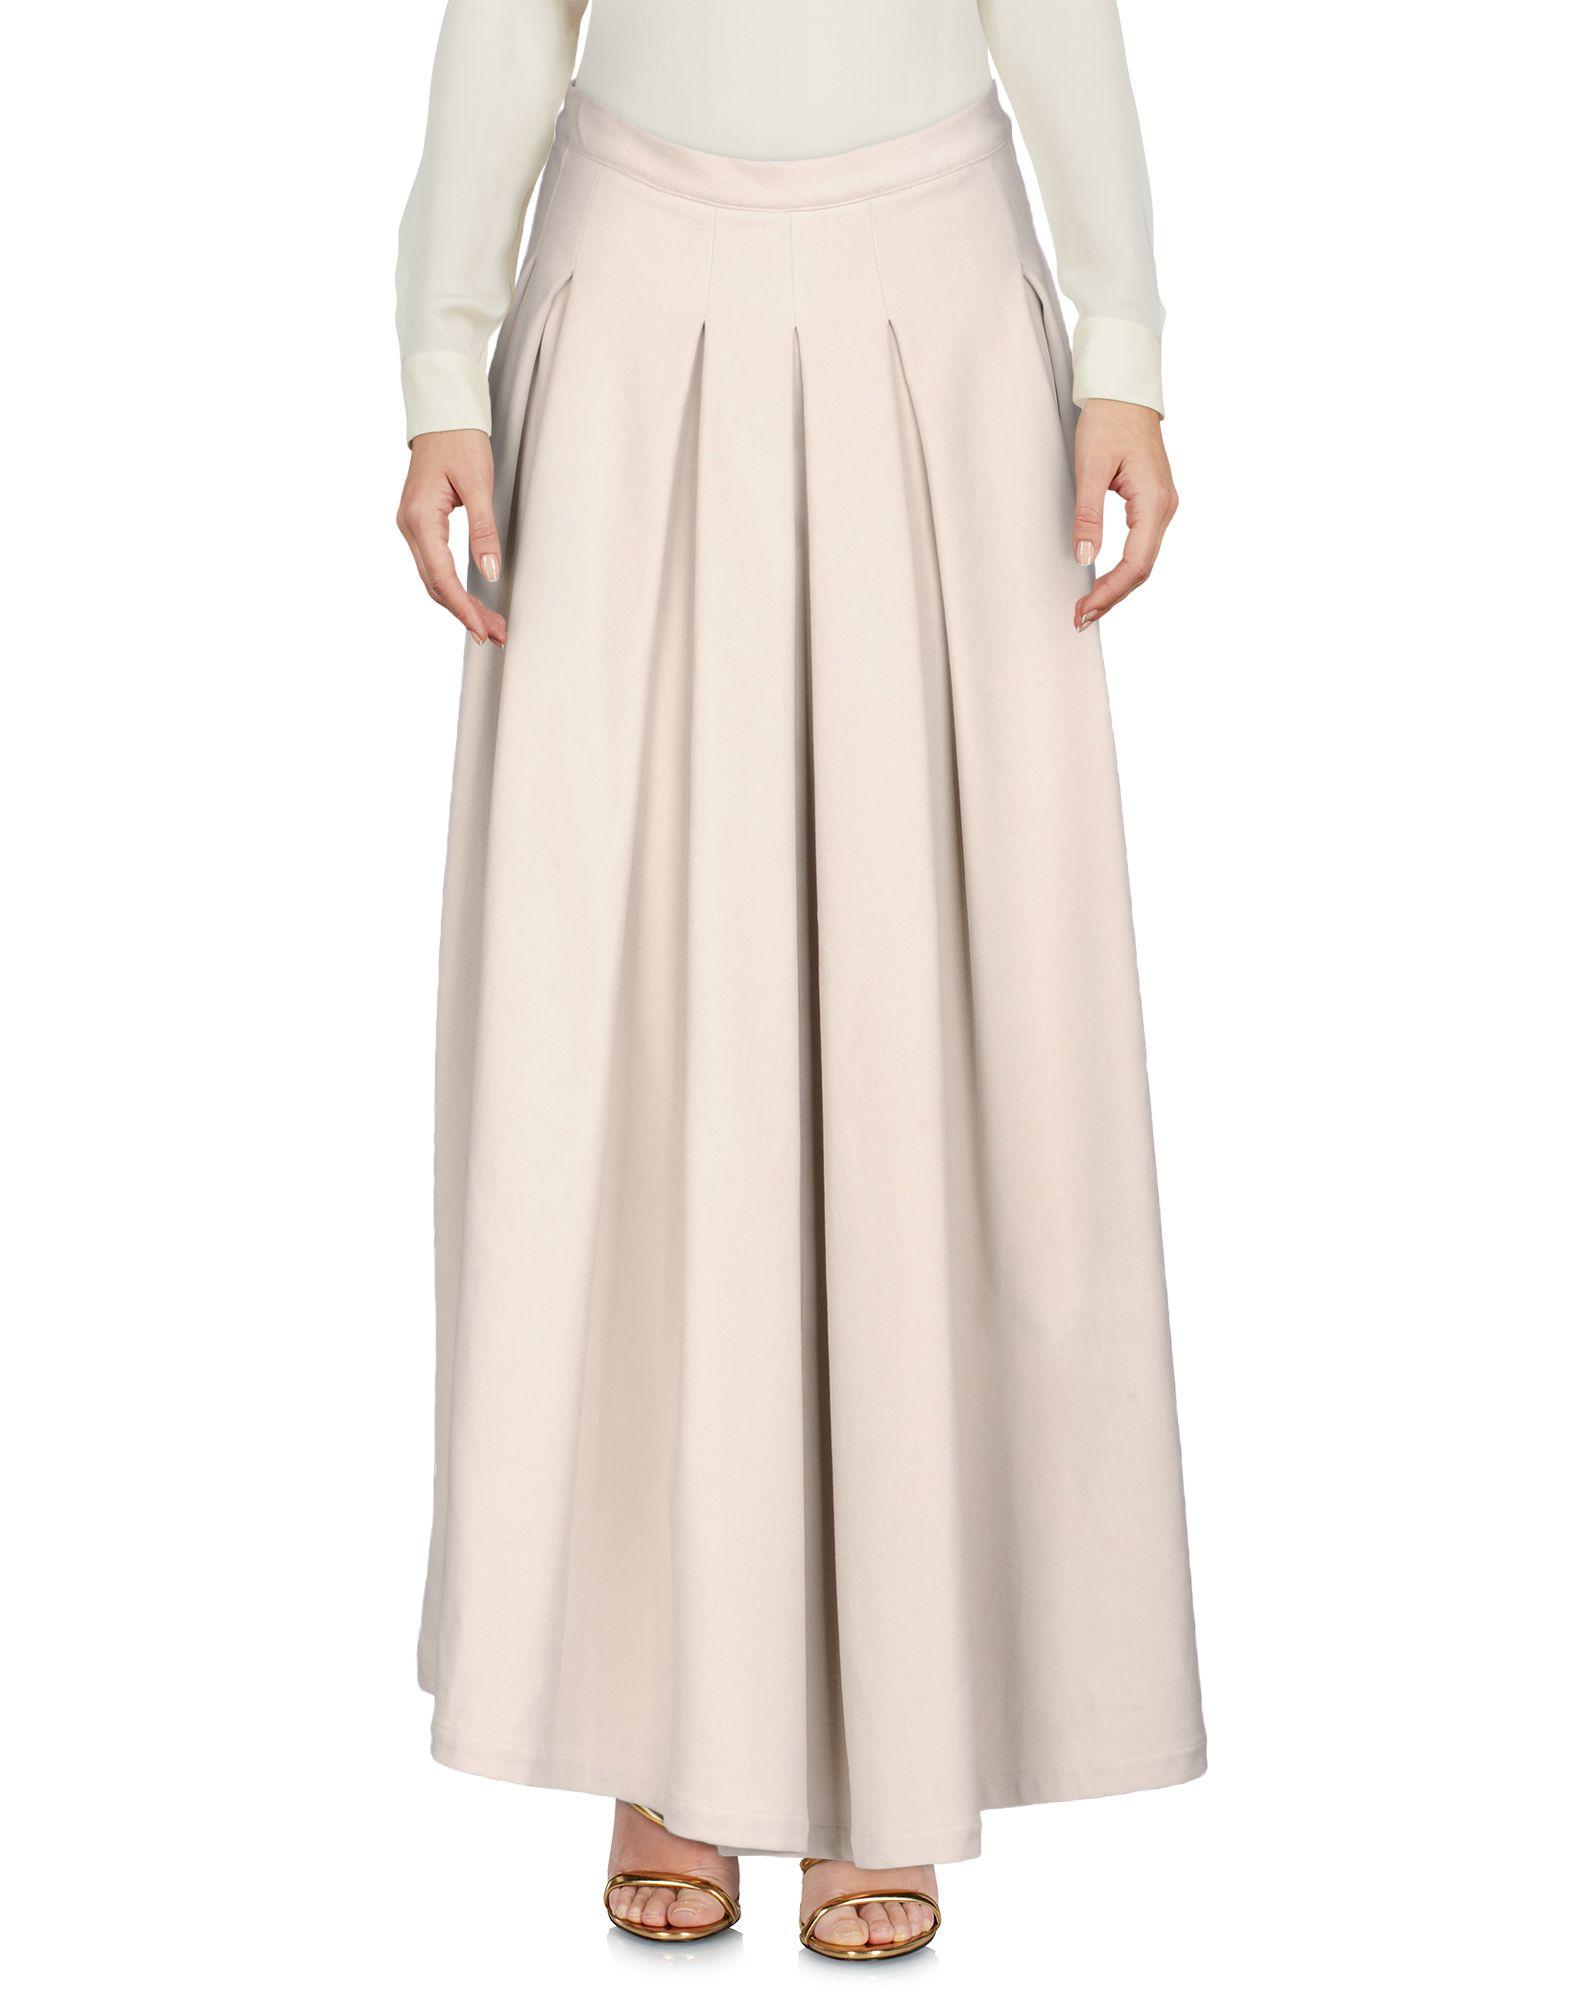 Gentryportofino Maxi Skirts